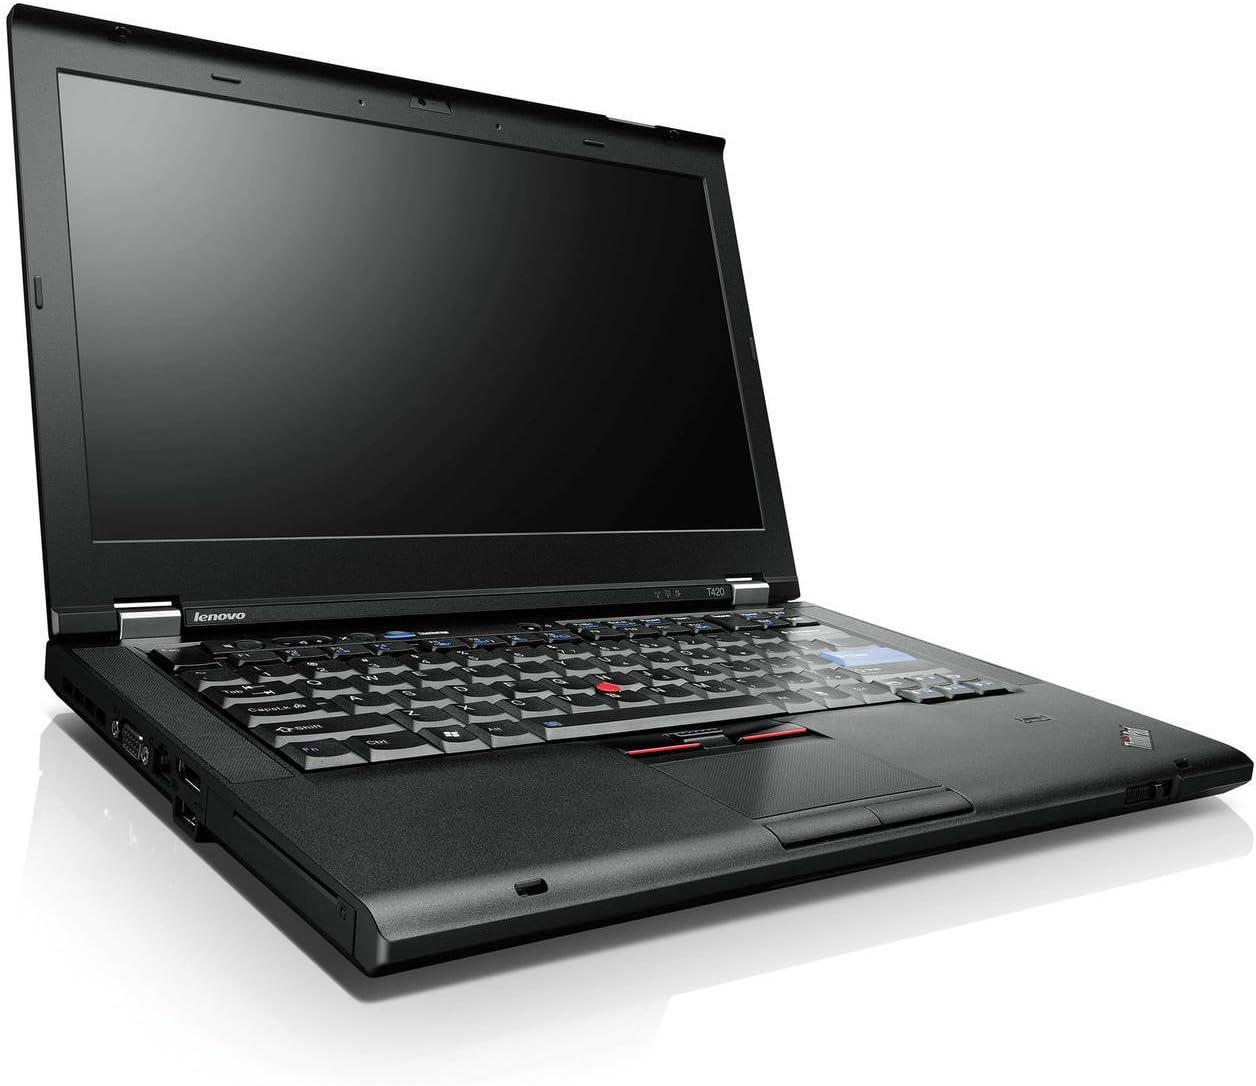 Fort Worth Mall Lenovo ThinkPad T420 Laptop price WEBCAM - DDR3 2.50ghz i5 8GB 320